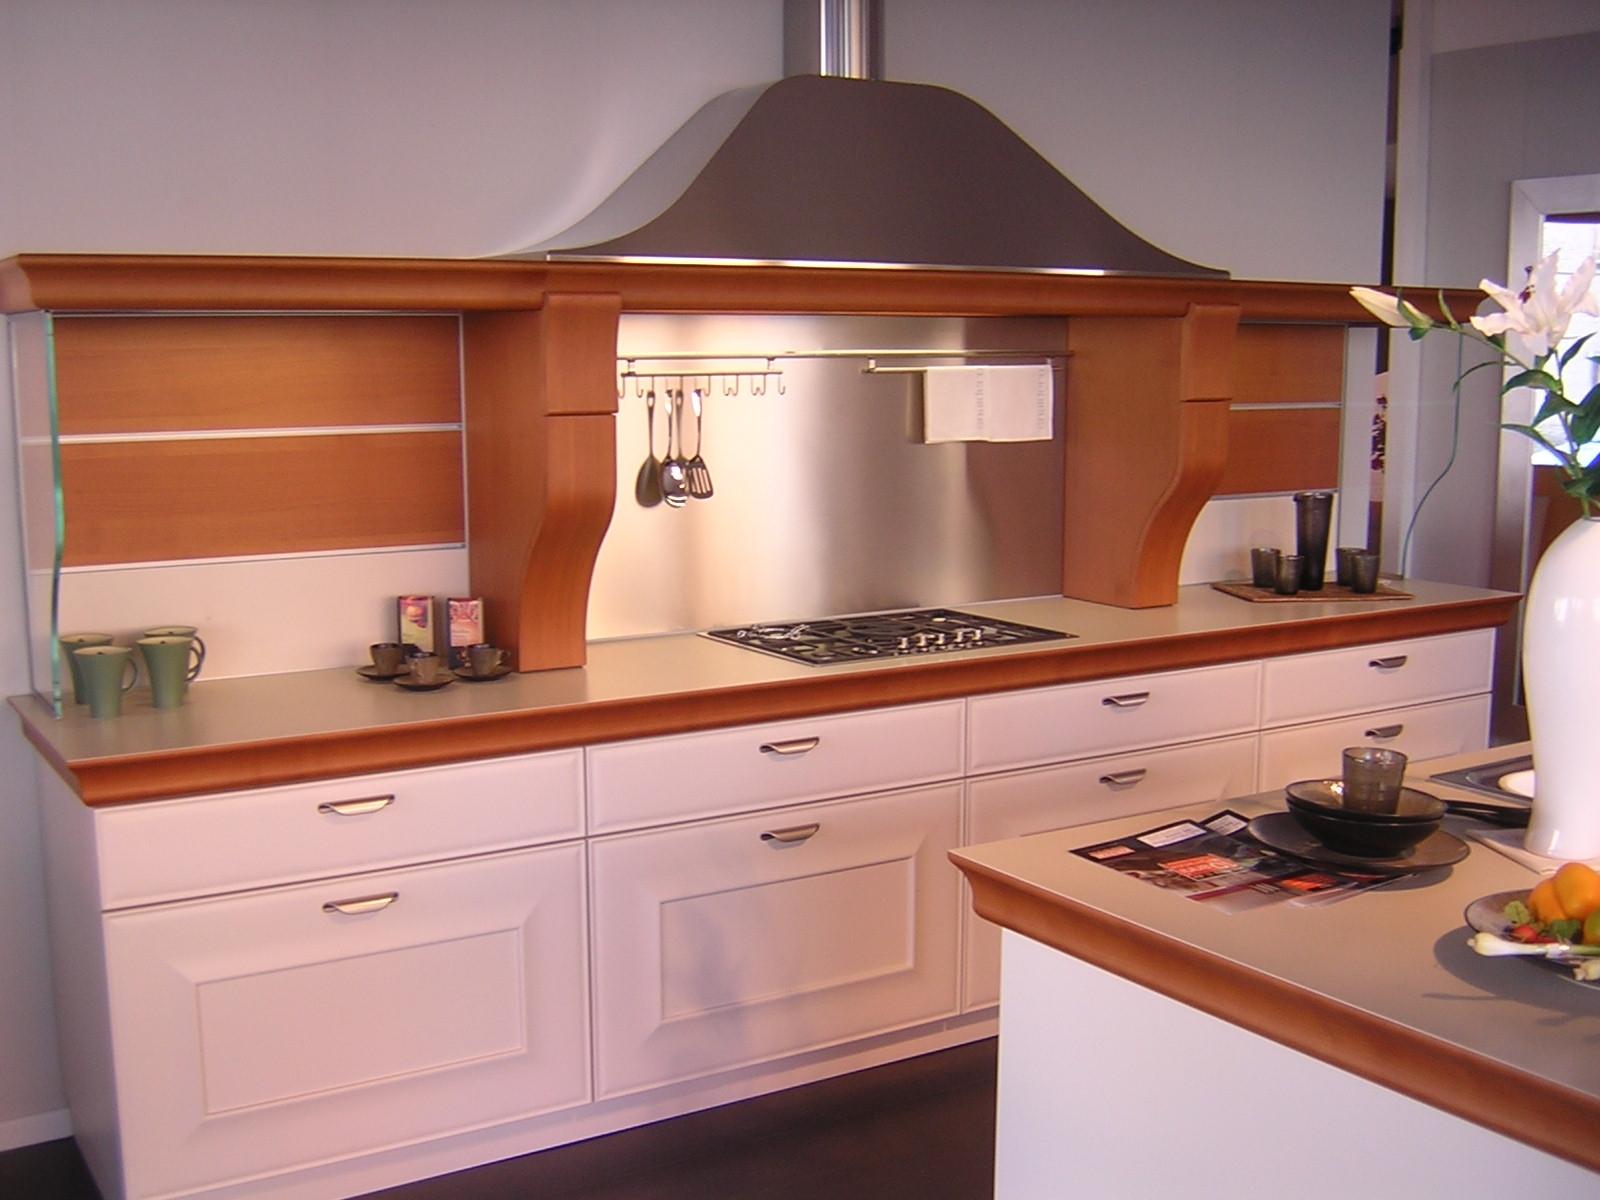 Snaidero cucina gioconda laccopacoate cucine a prezzi - Cucine componibili bianche ...